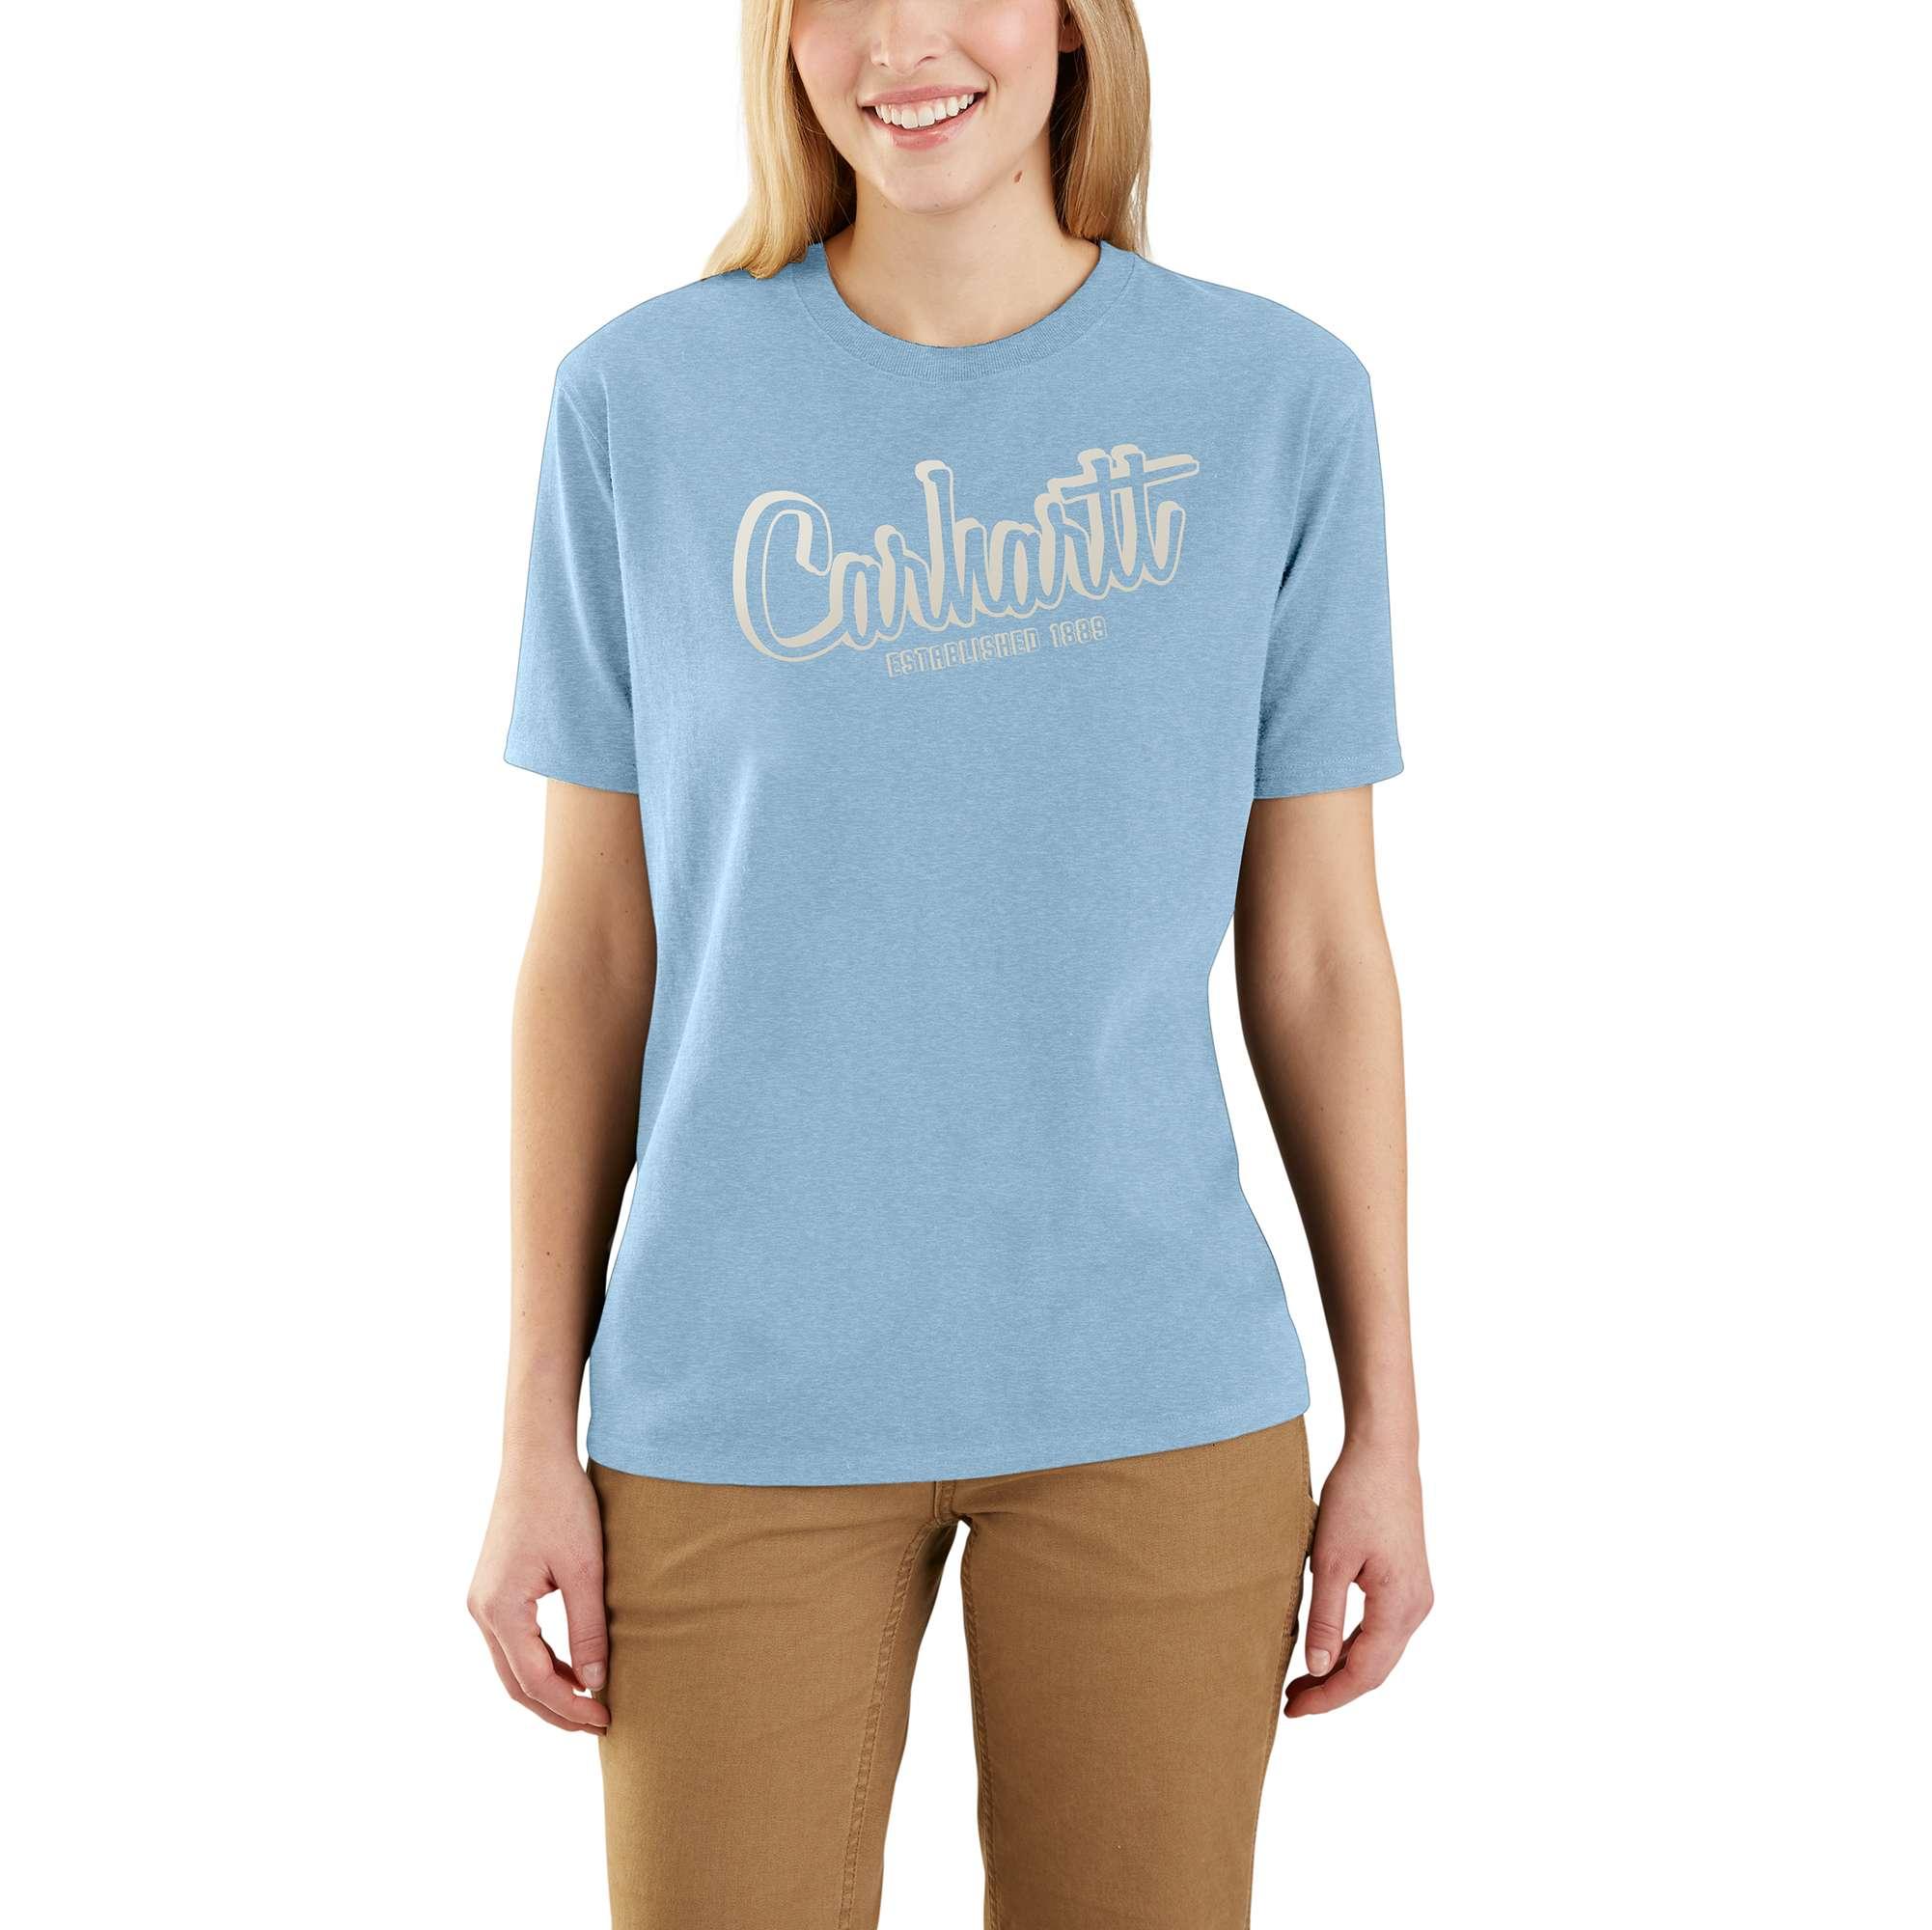 Loose Fit Heavyweight Short-Sleeve Carhartt Graphic T-Shirt